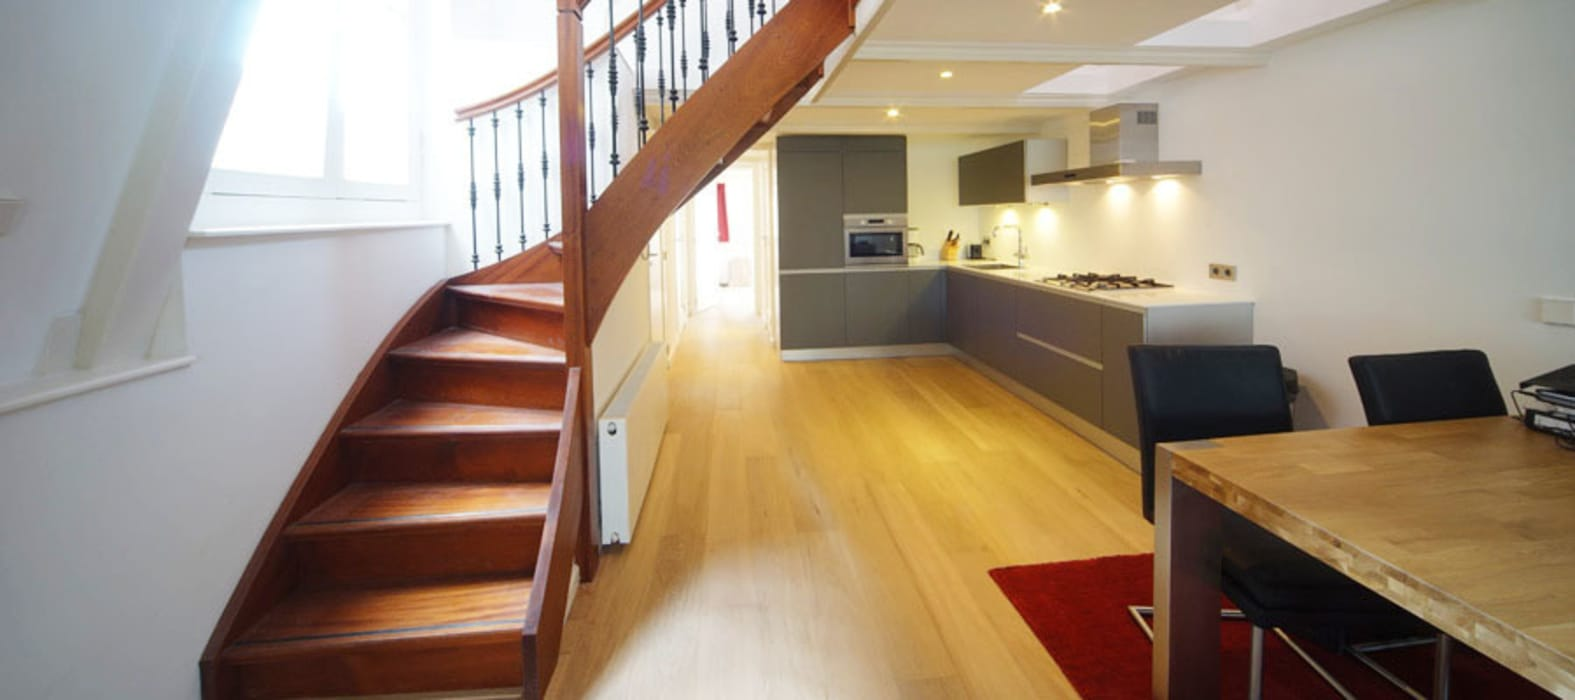 trap in de vide Moderne keukens van BALD architecture Modern